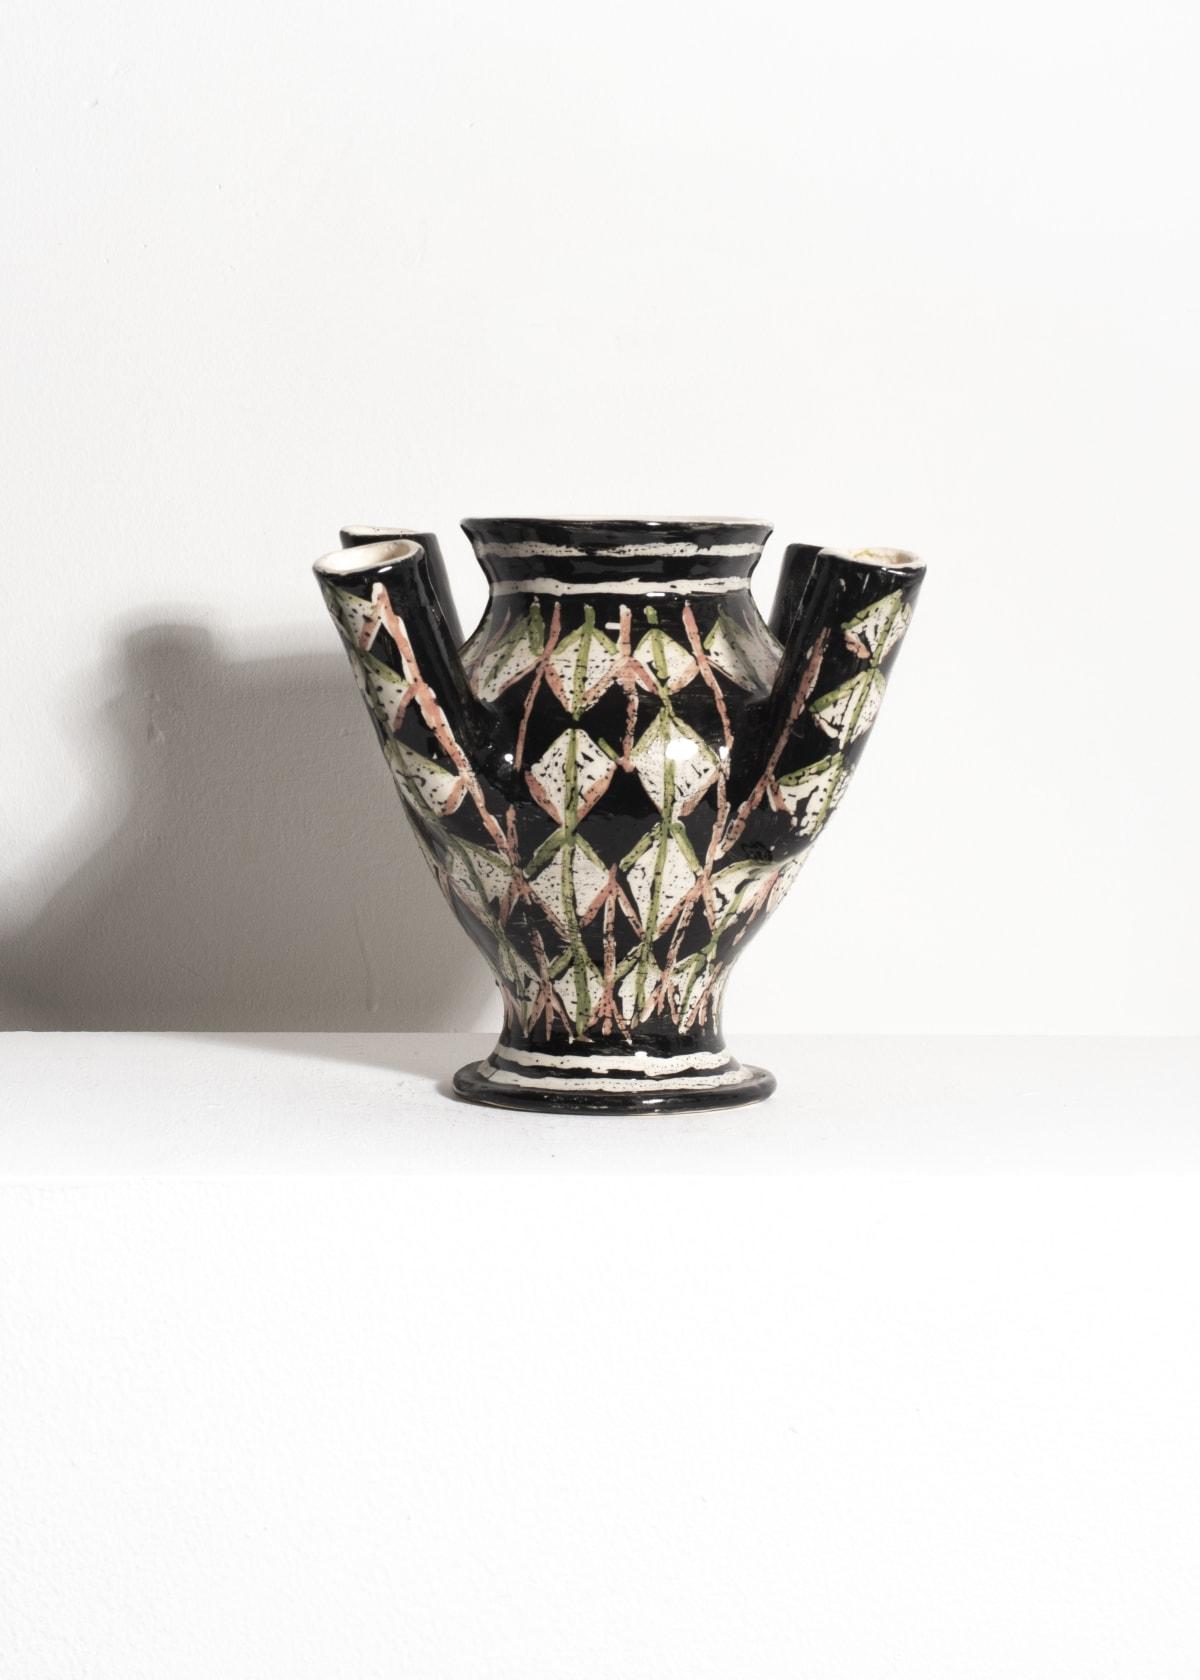 Prue Piper Patterned Flower Vase Tin glazed earthenware H 5 cm x W 8 cm